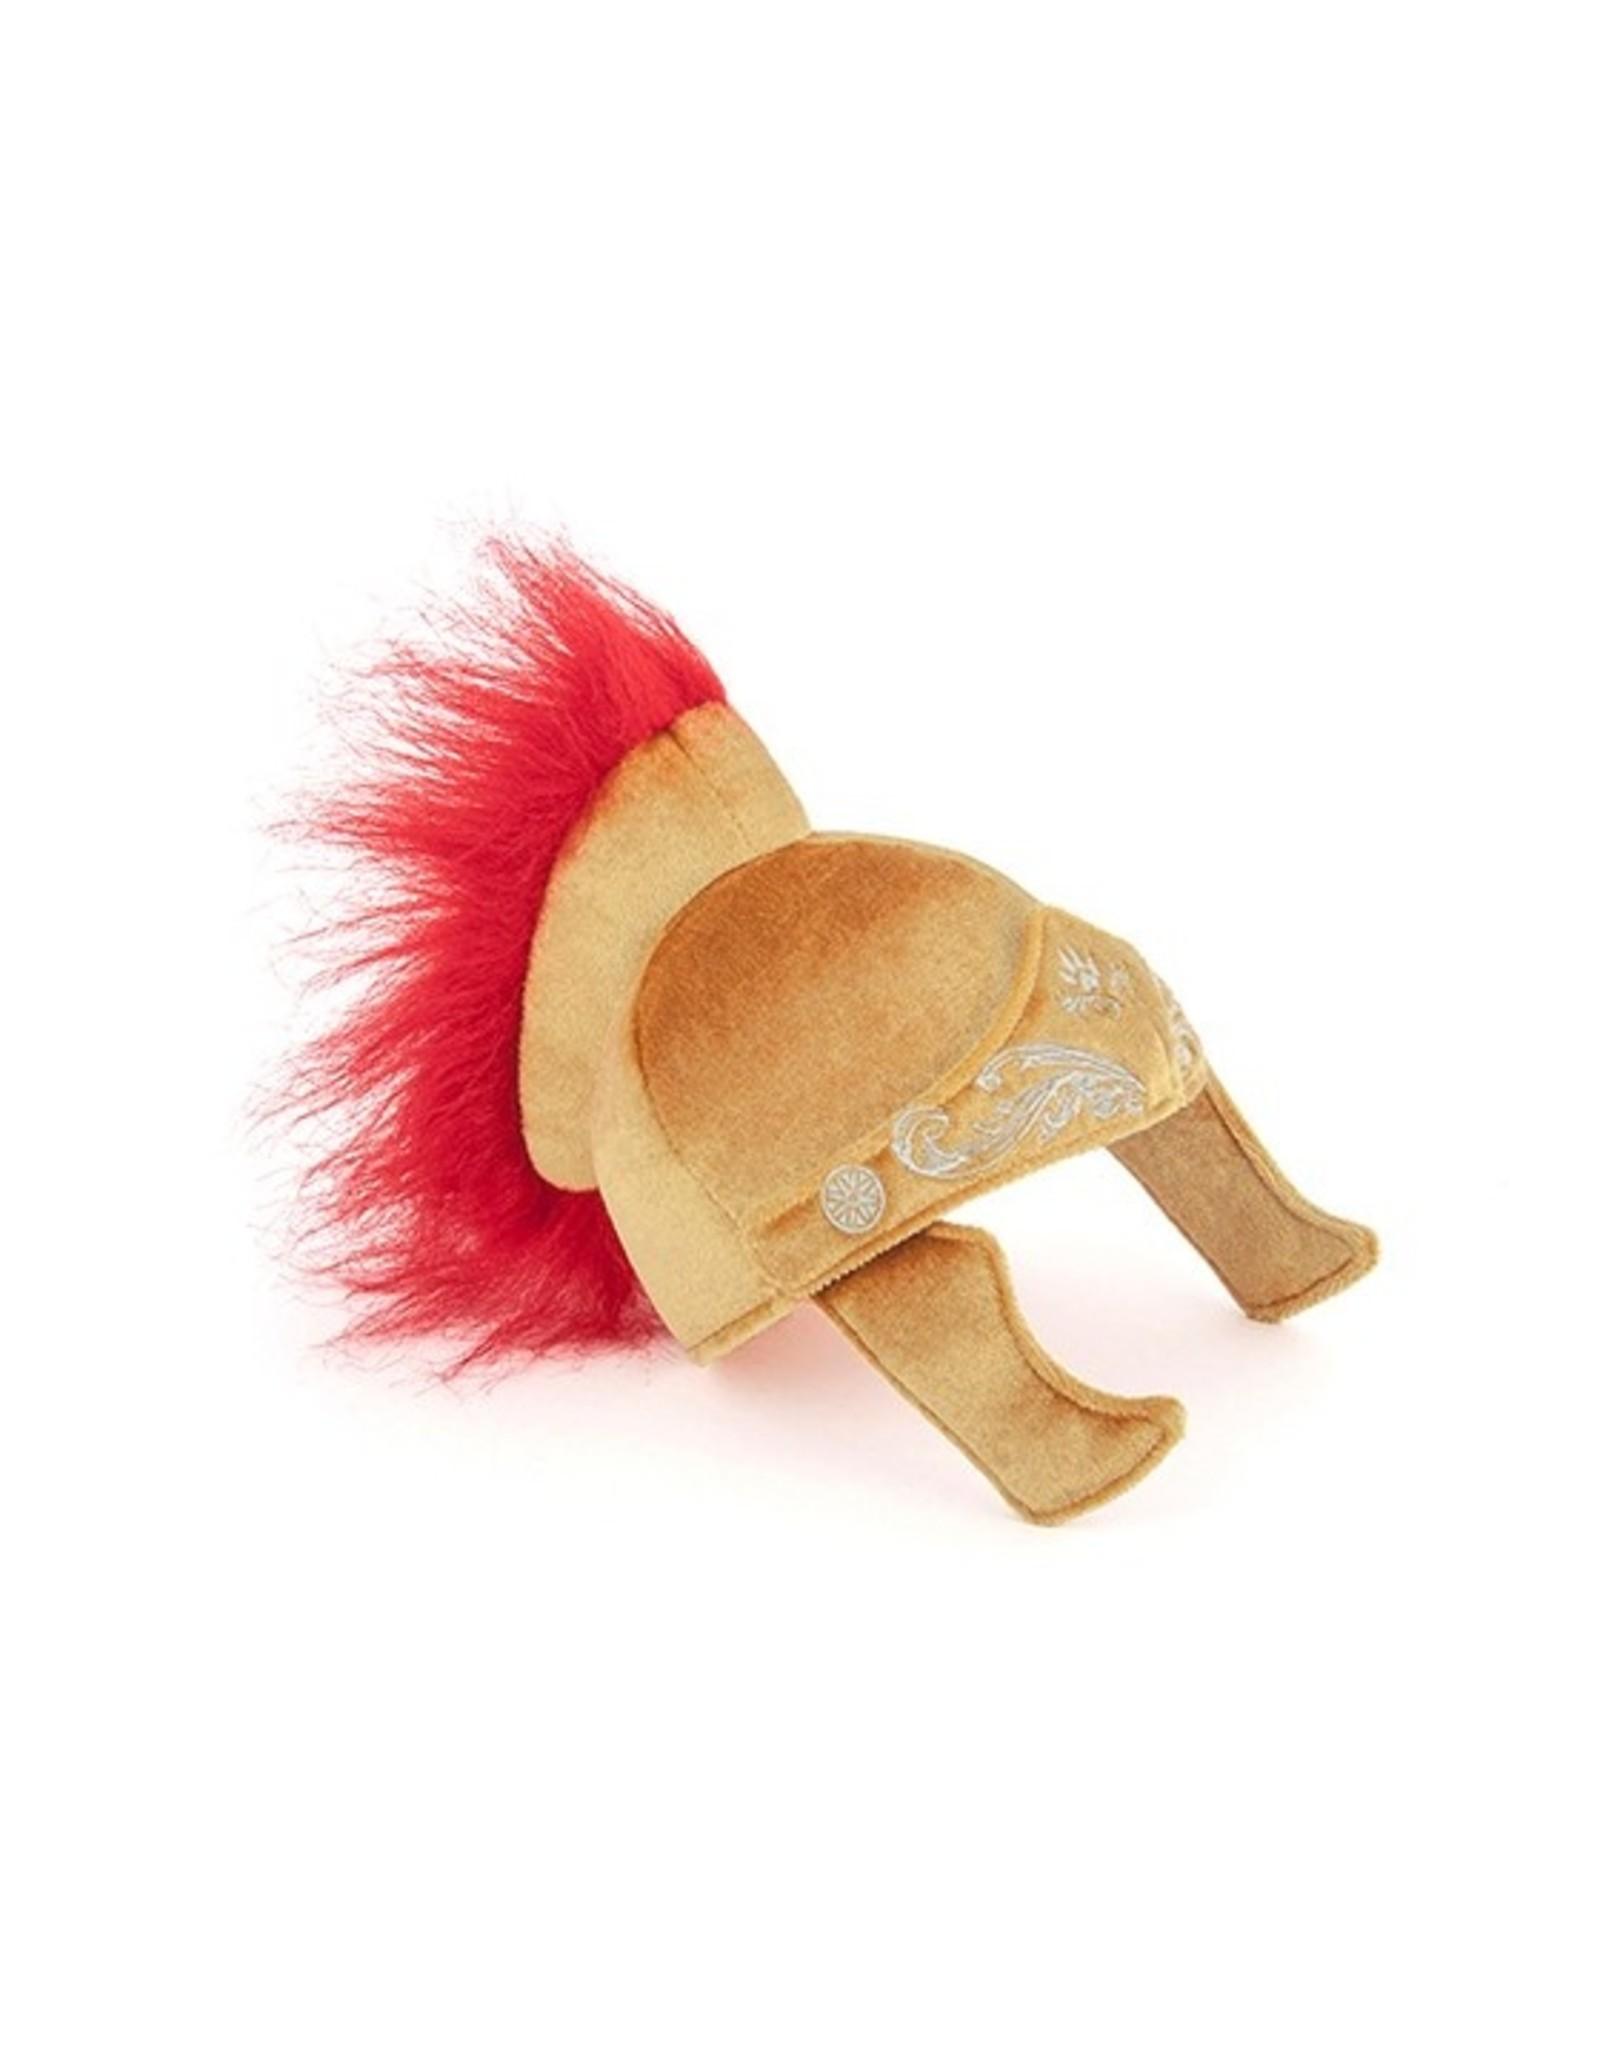 PLAY PLAY Mutt Hatter Gladiator